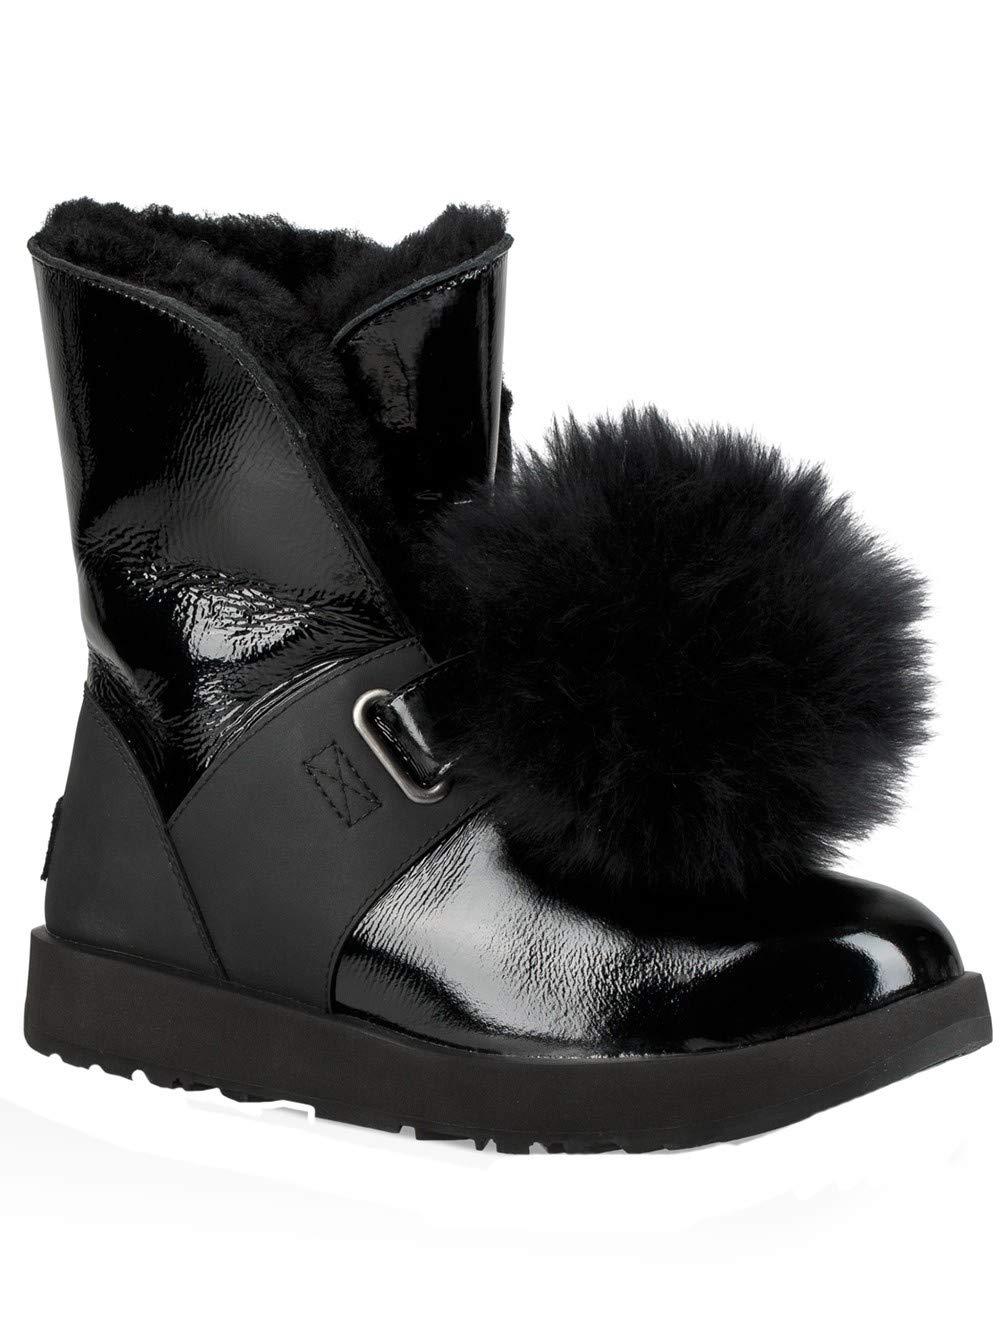 UGG Women's W Isley Patent Waterproof Fashion Boot Black 8 M US by UGG